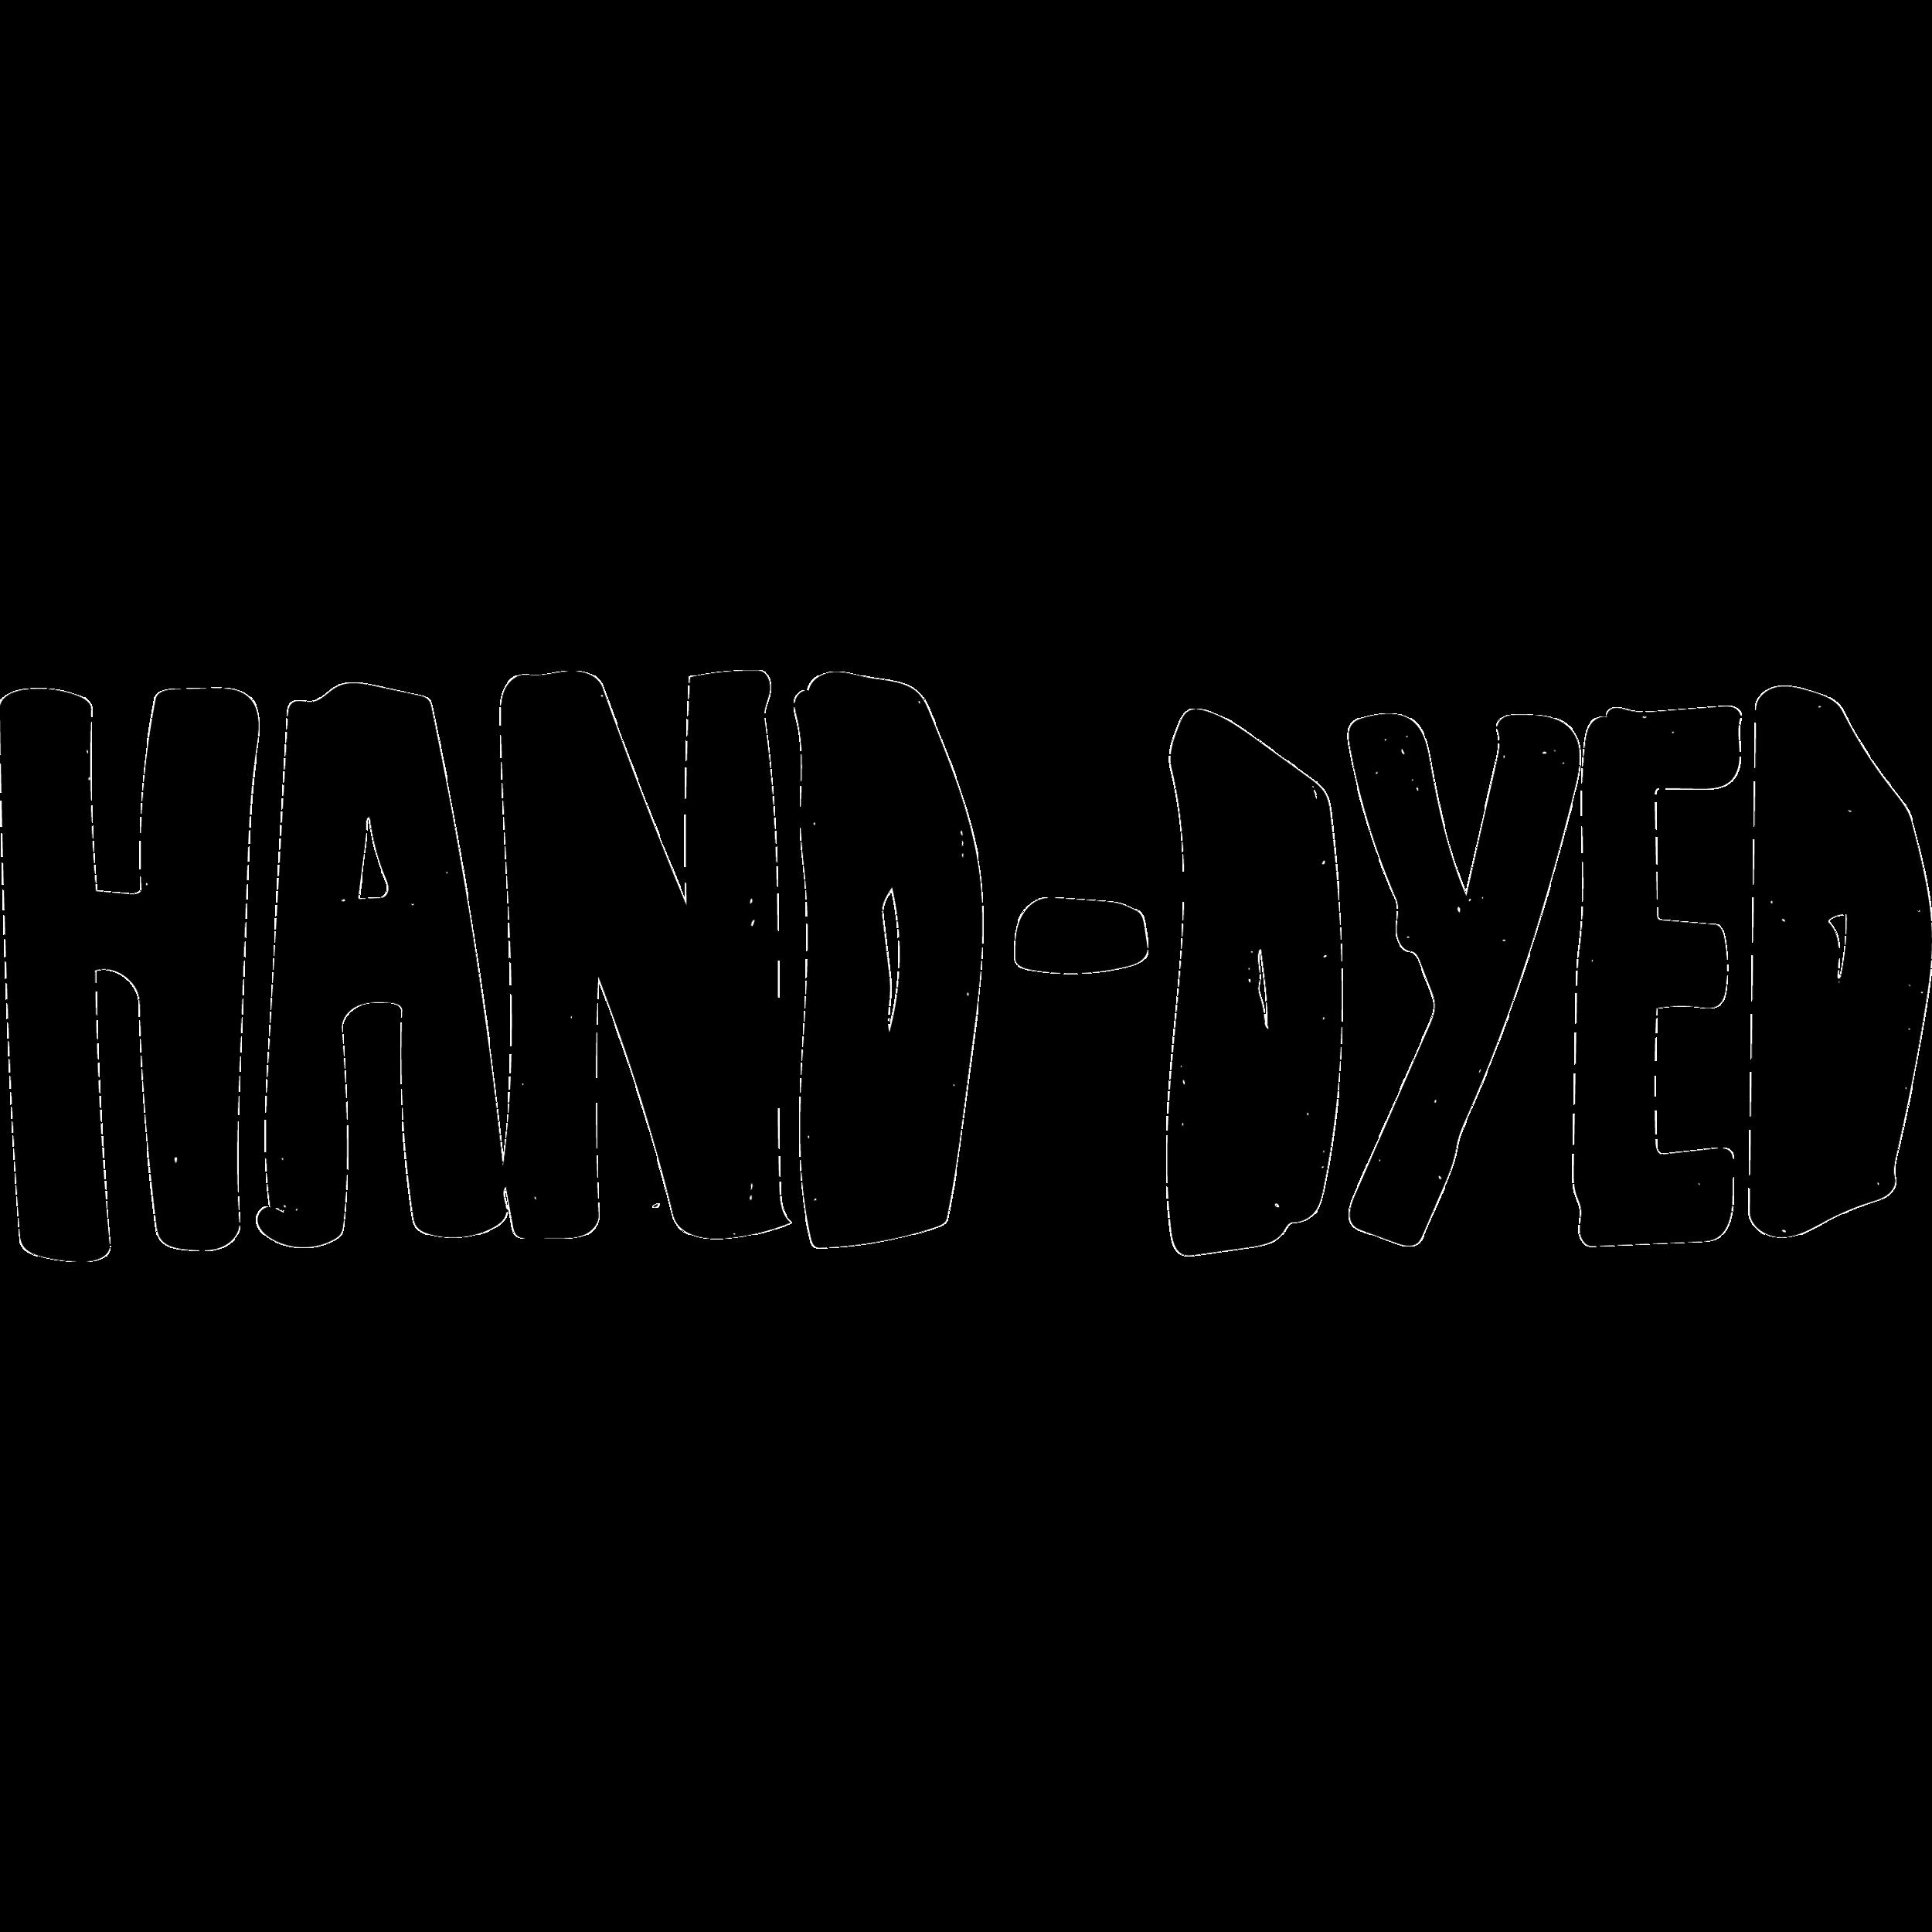 handpun_vector.png